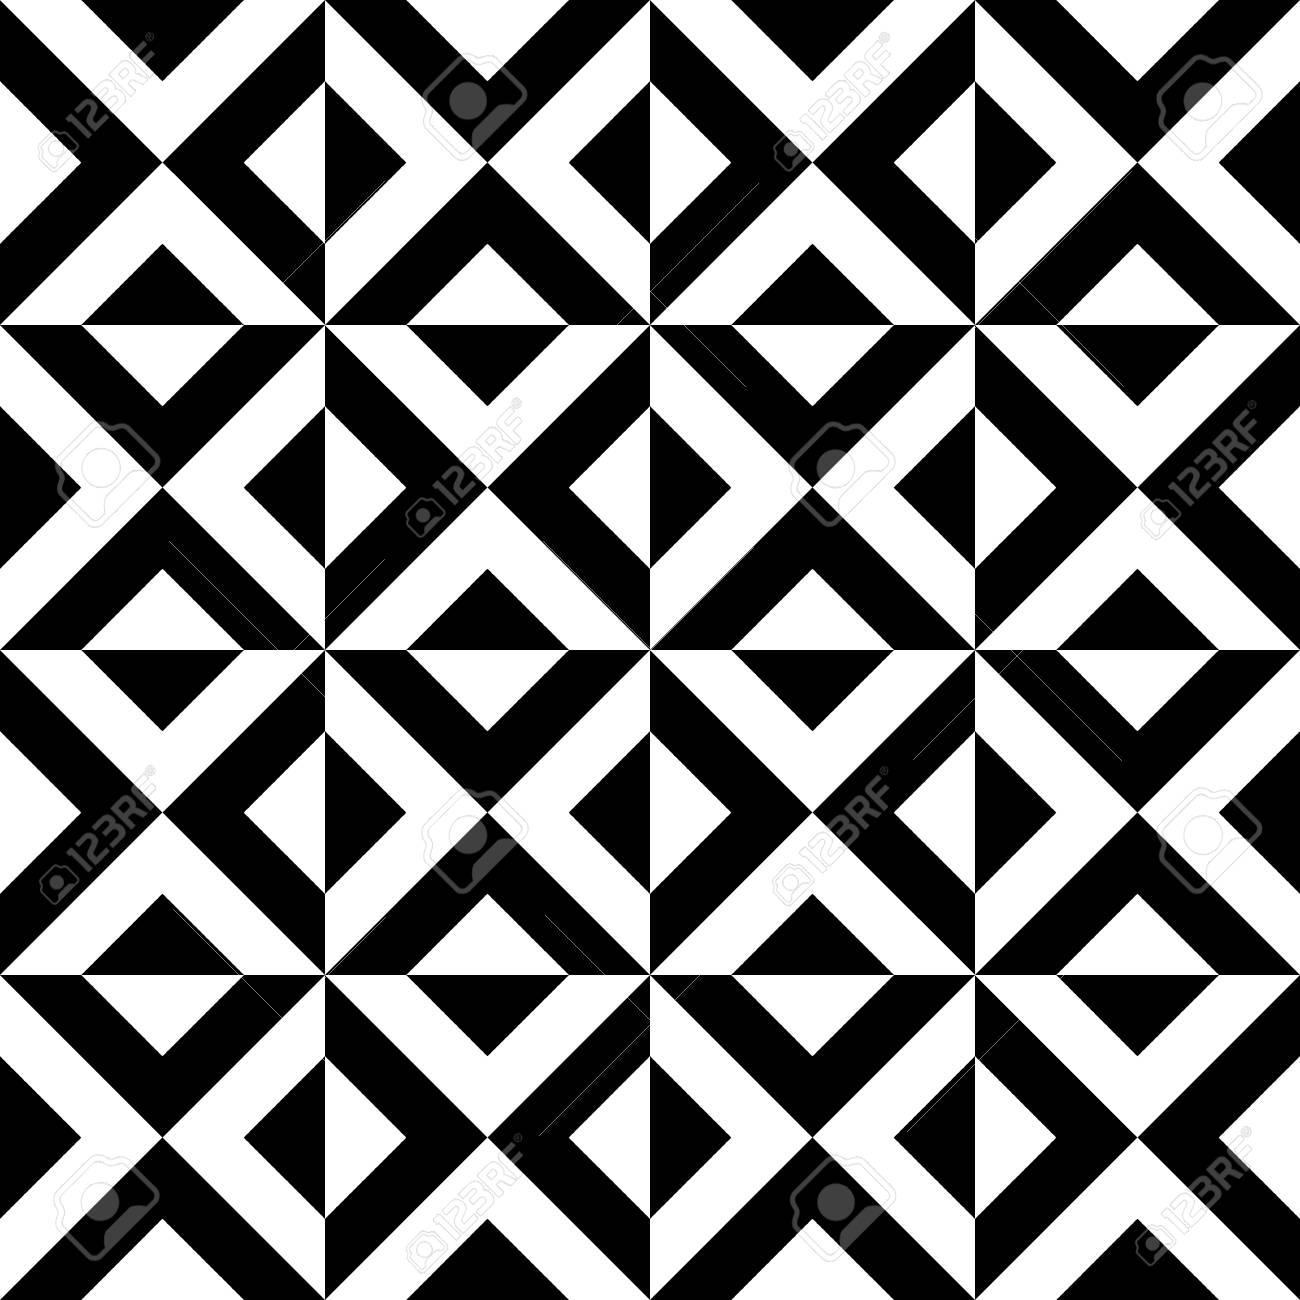 Arabic Geometric Patterns Decorative Black White Triangles